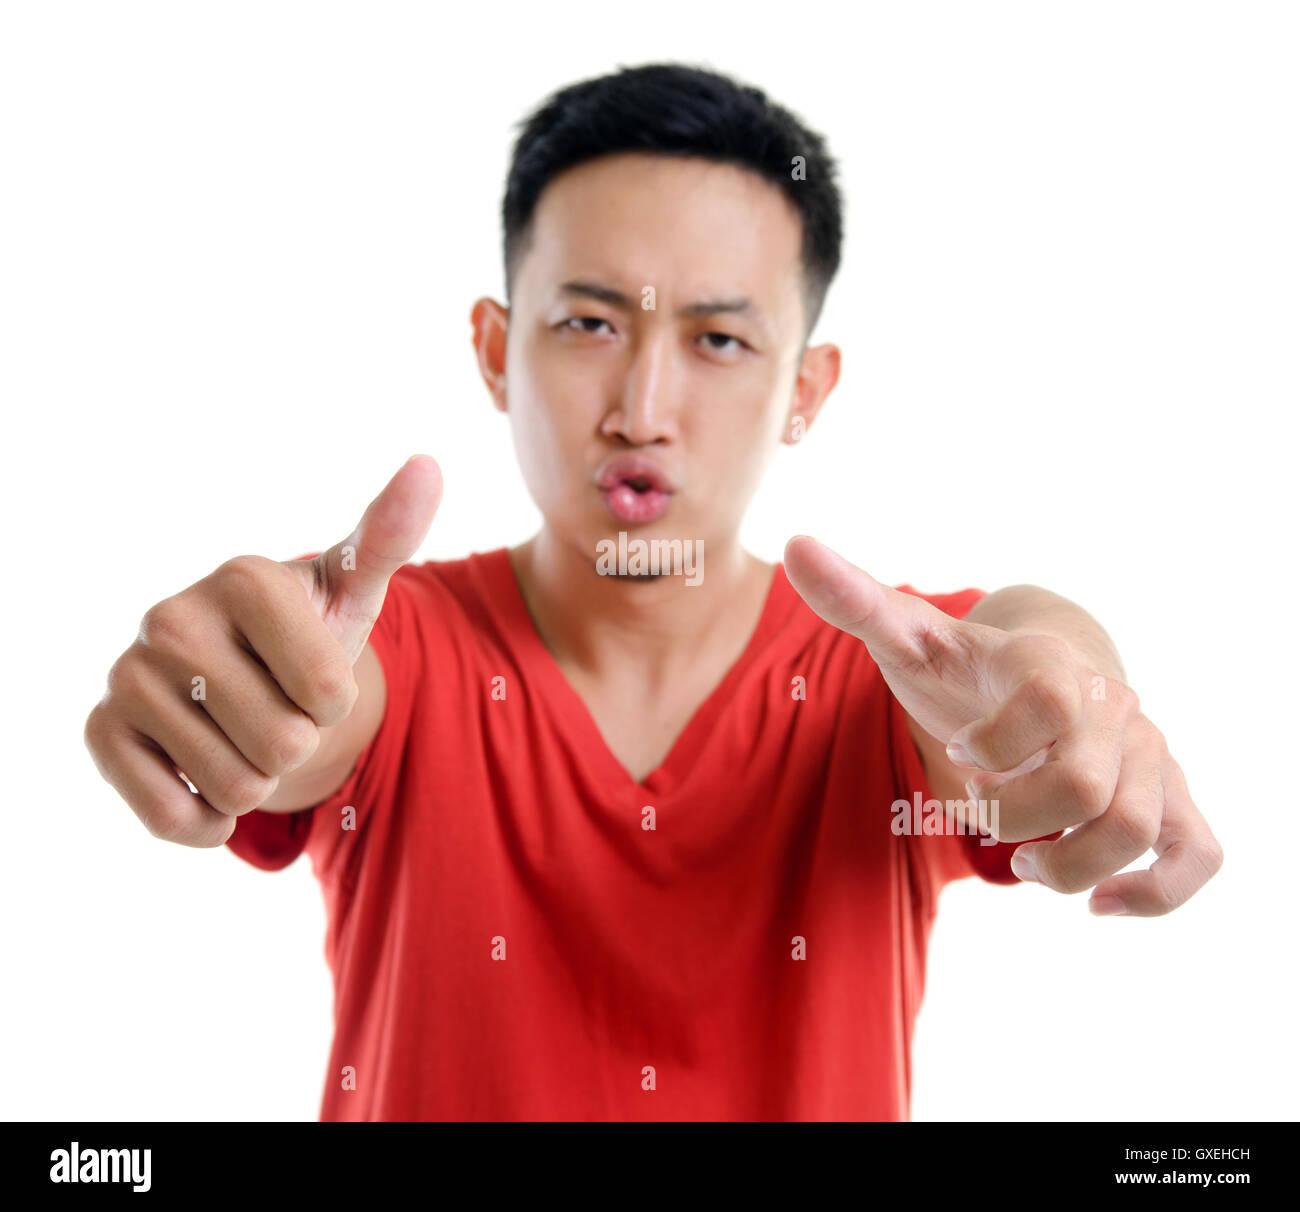 South east asian men